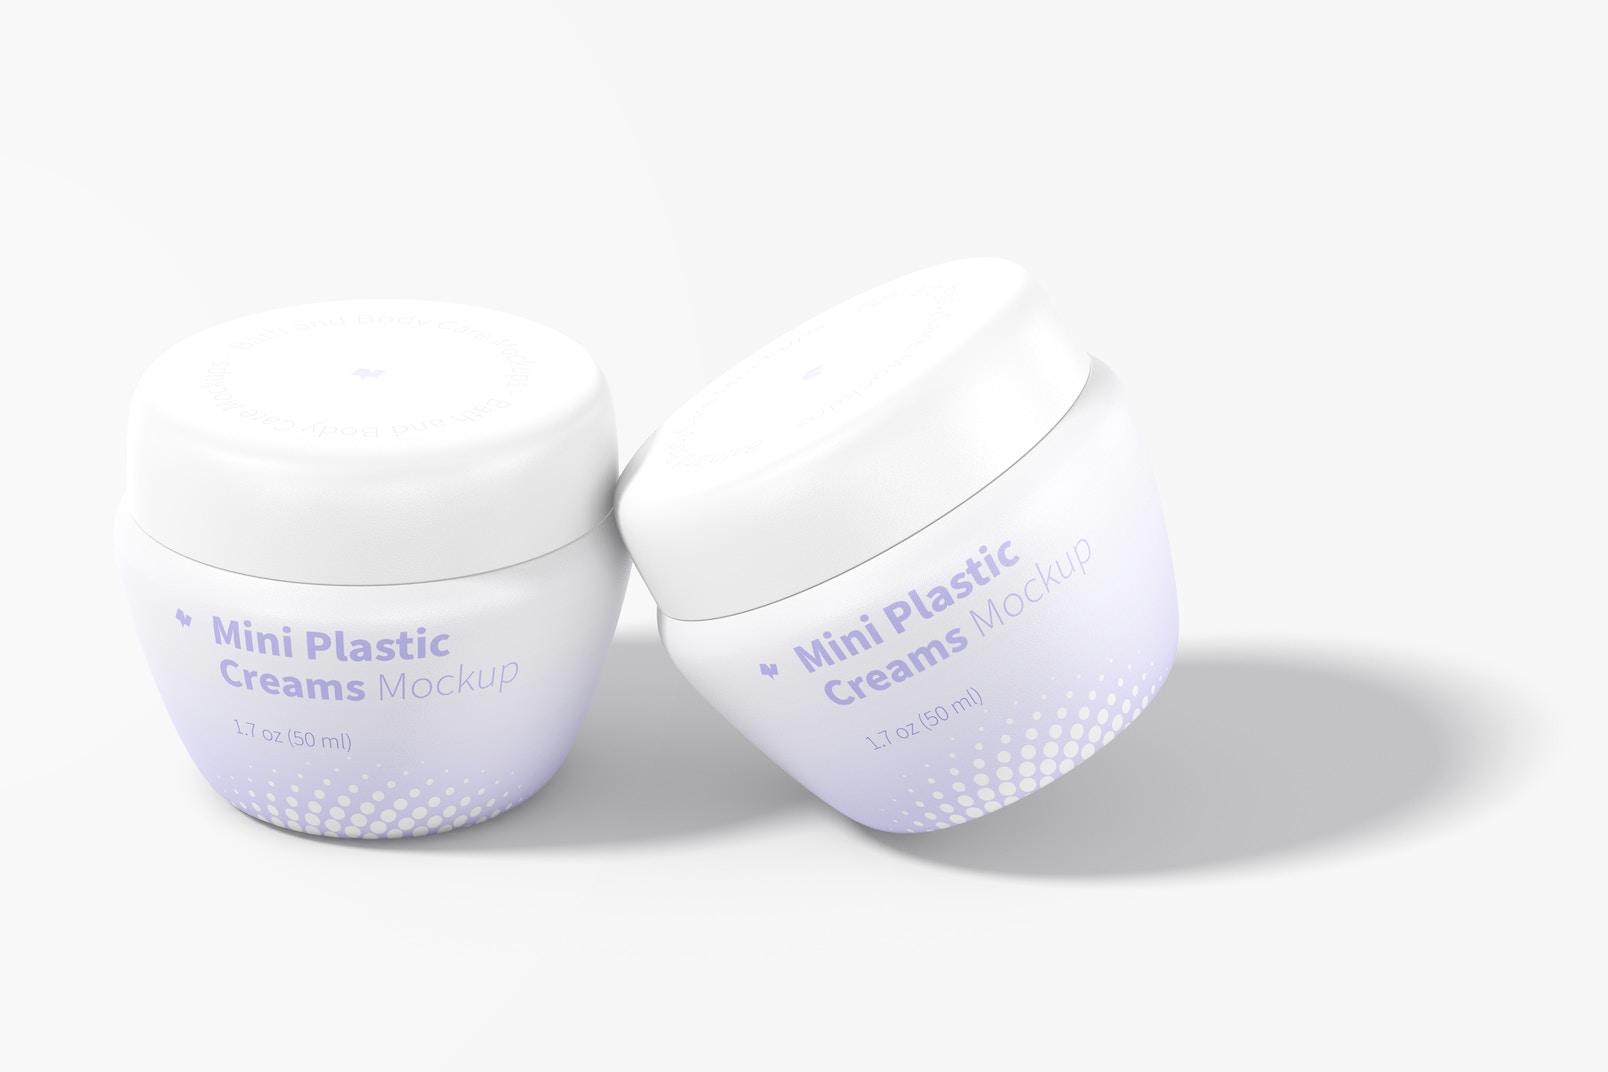 Mini Plastic Cream Jars with Lid Mockup, Perspective View